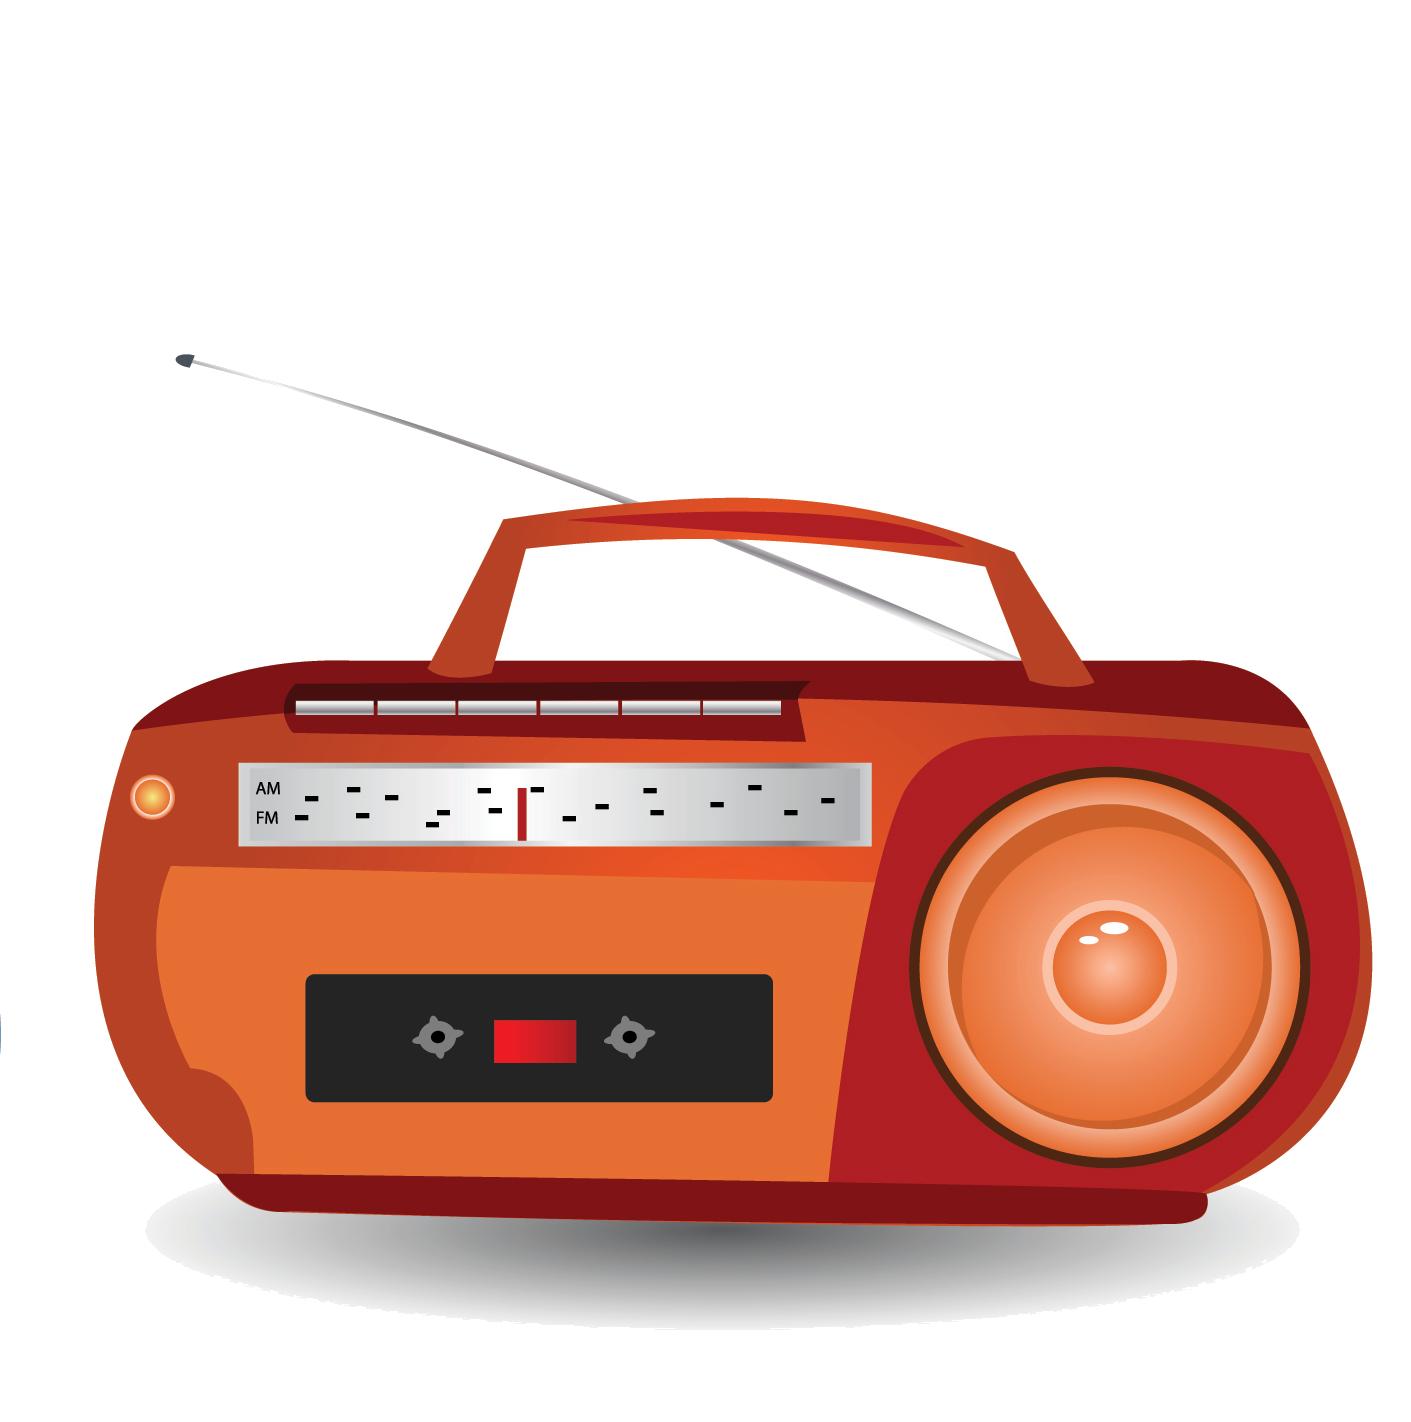 Boombox clipart fm radio, Boombox fm radio Transparent FREE.